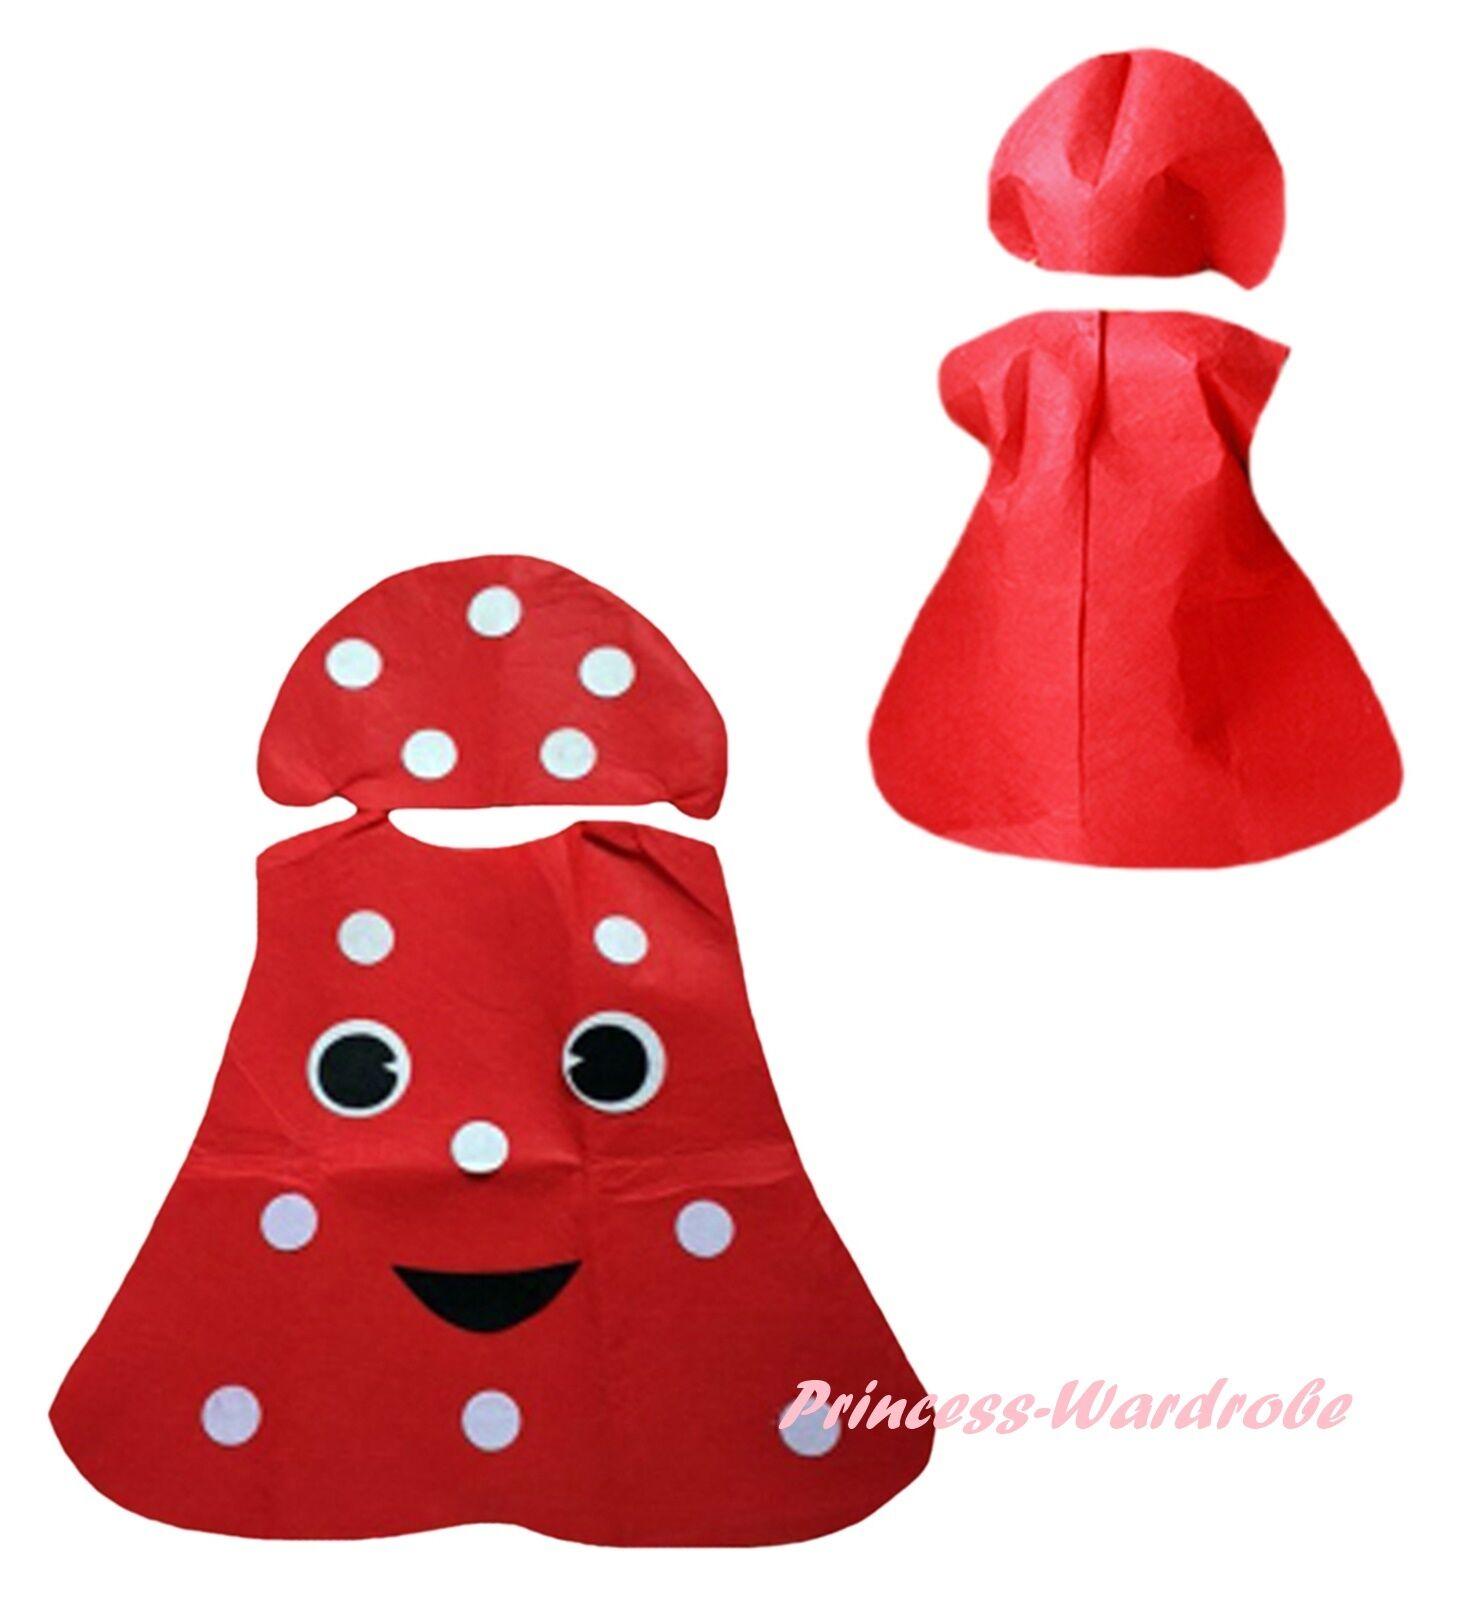 Xmas Halloween School Party Red Dot Mushroom 2pc Kids Child Cloth Unisex Costume